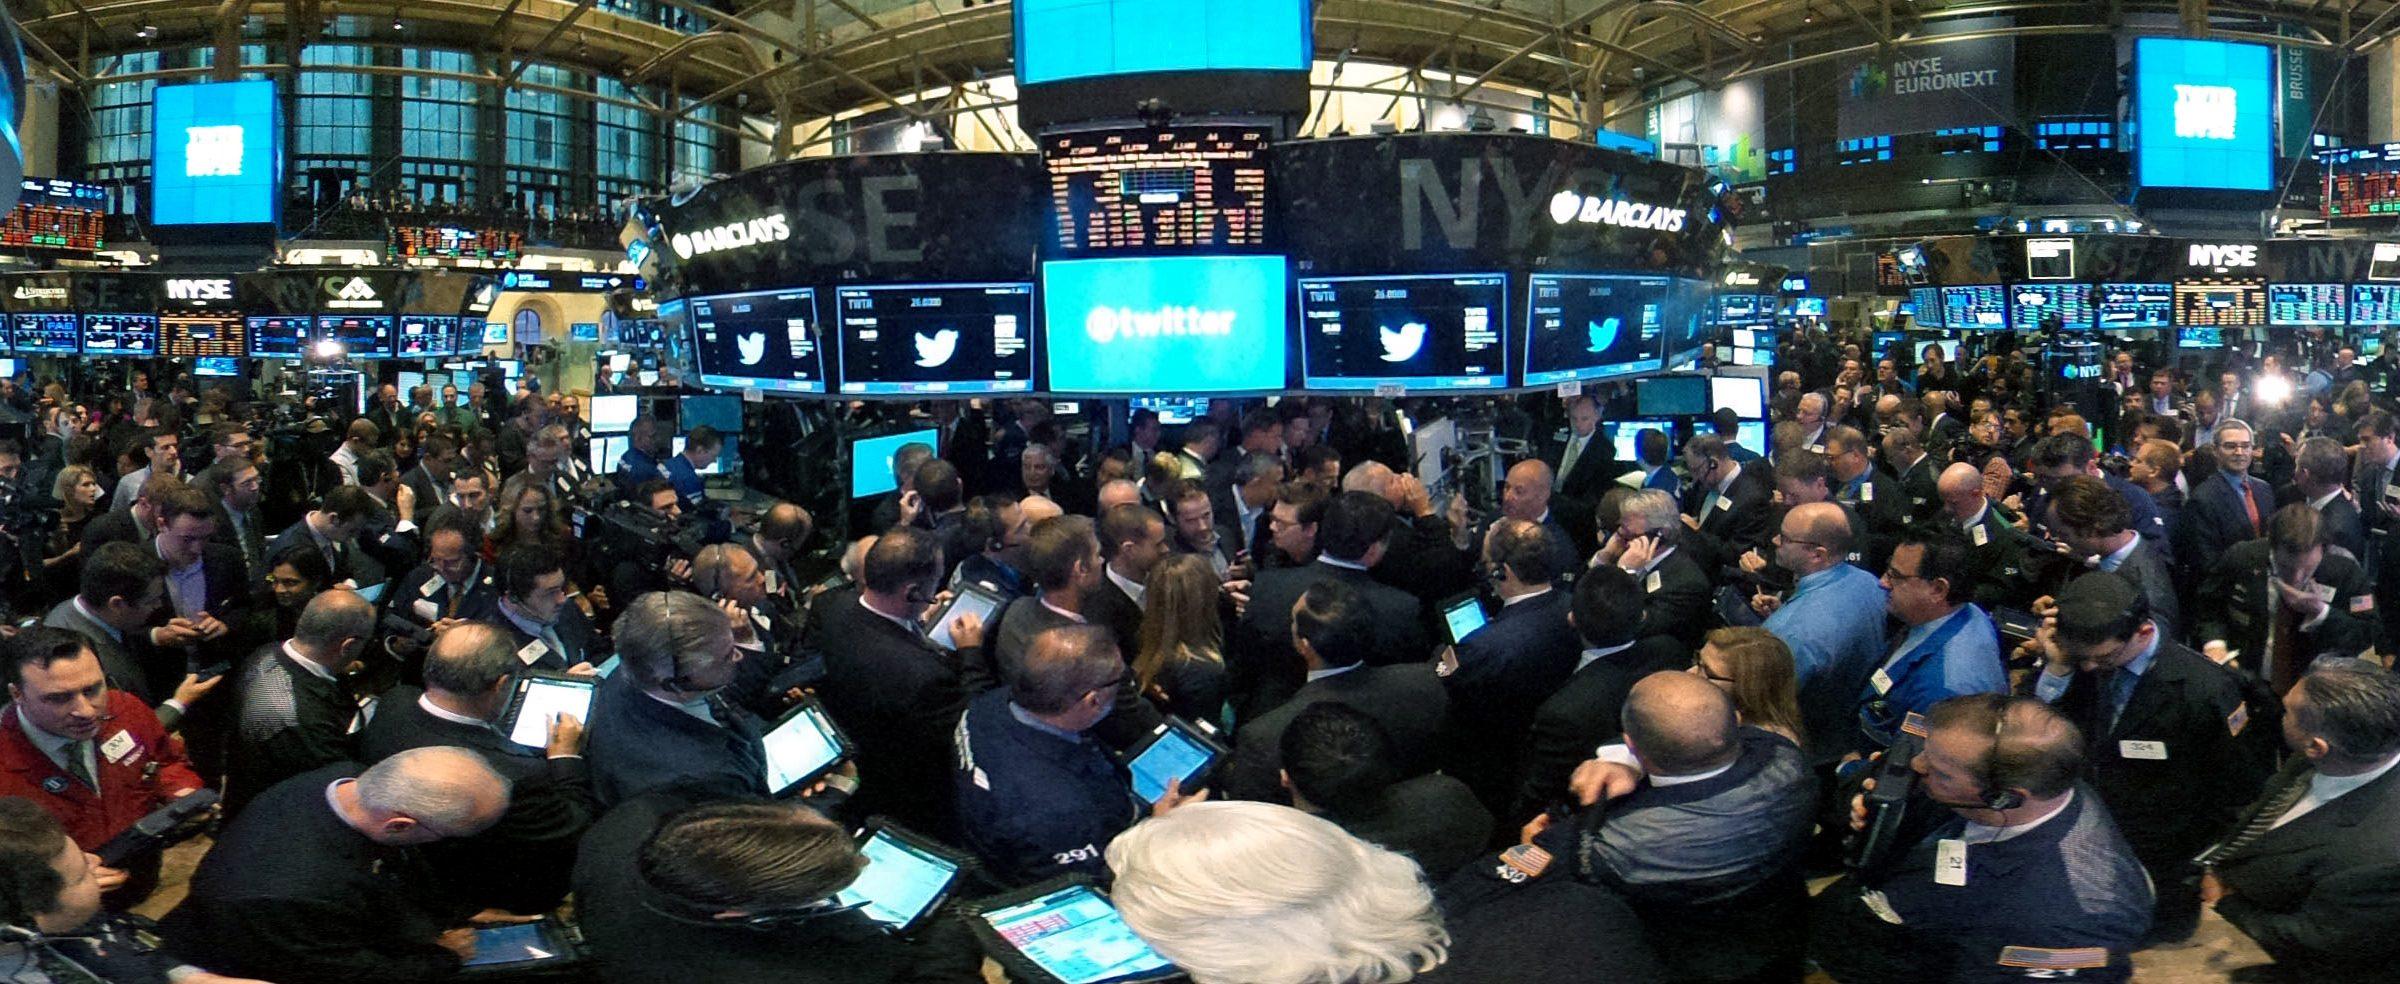 new-york-stock-exchange-trading-floor-6763750